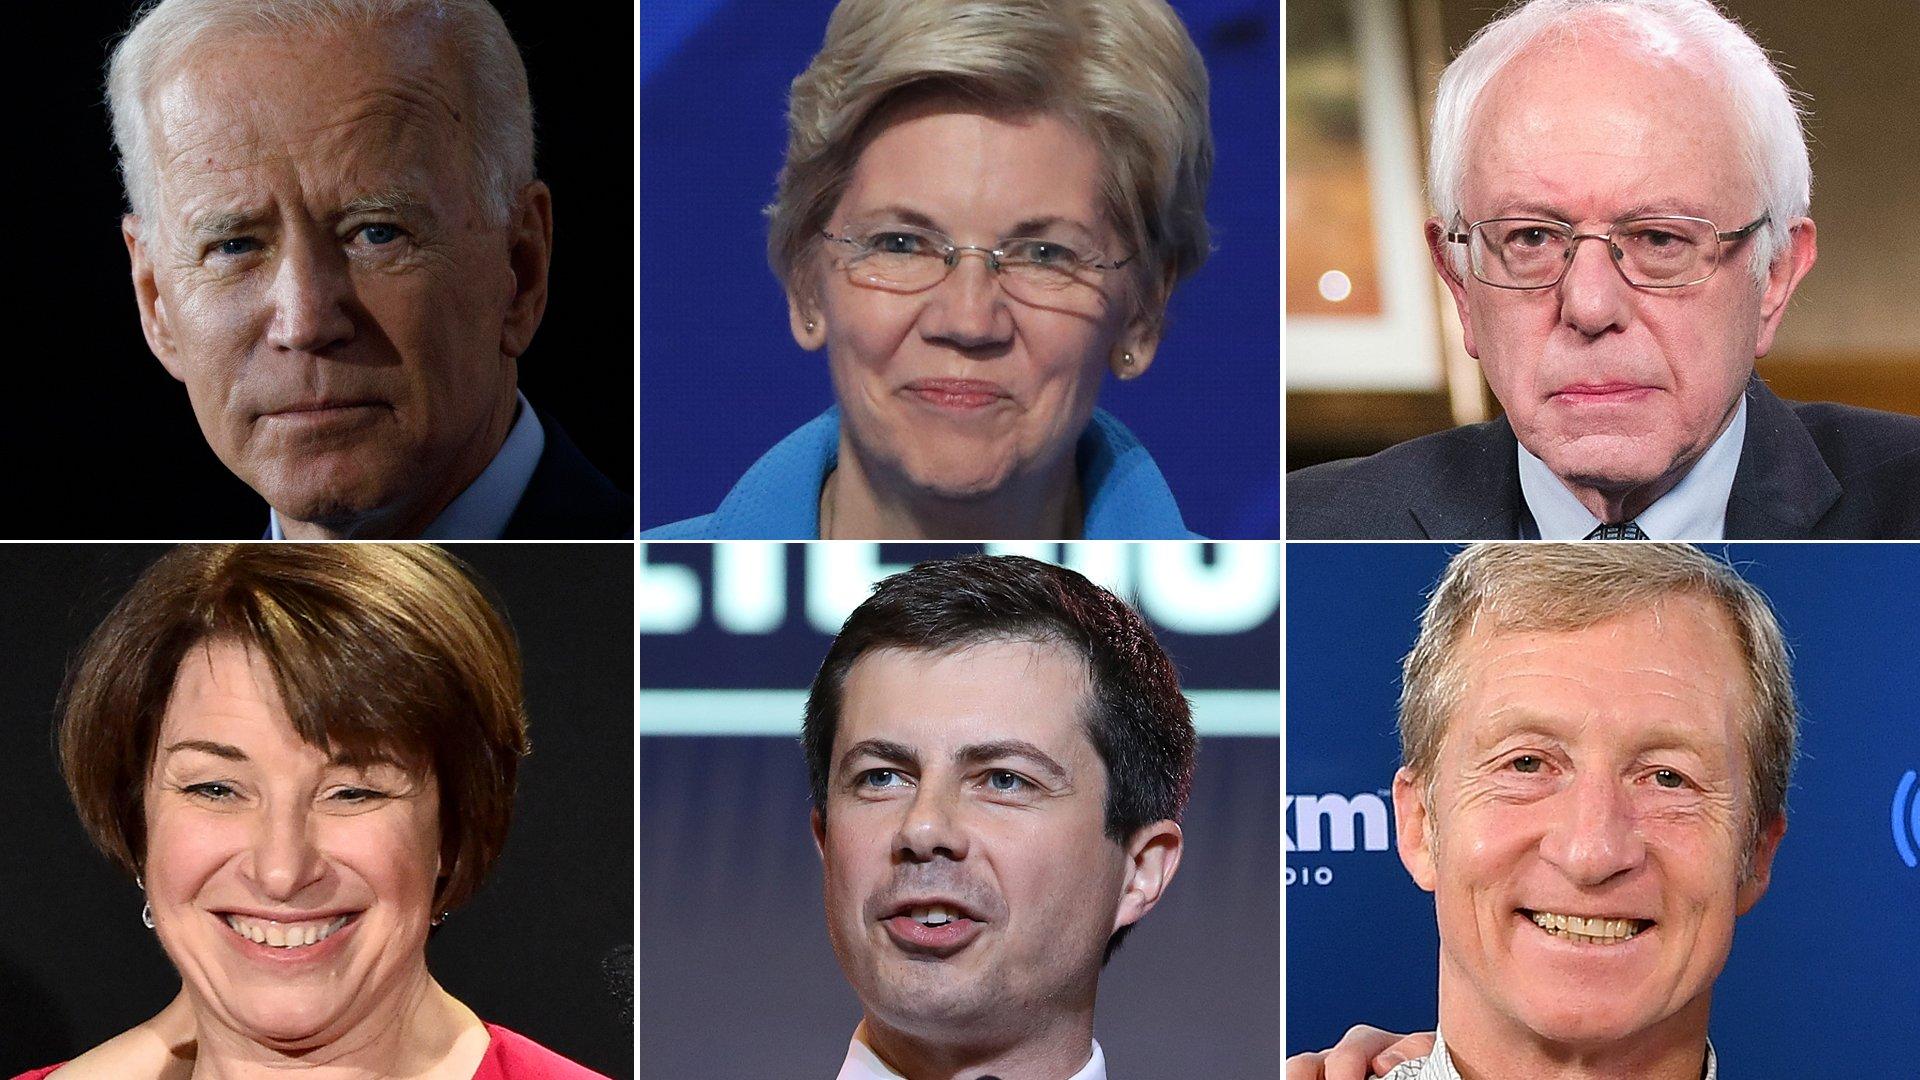 Joe Biden, Elizabeth Warren, Bernie Sanders, Amy Klobuchar, Pete Buttigieg and Tom Steyer, participants at a Democratic presidential debate in Iowa on Jan. 14, 2020, appear in a composite image. (Credit: Getty Images)